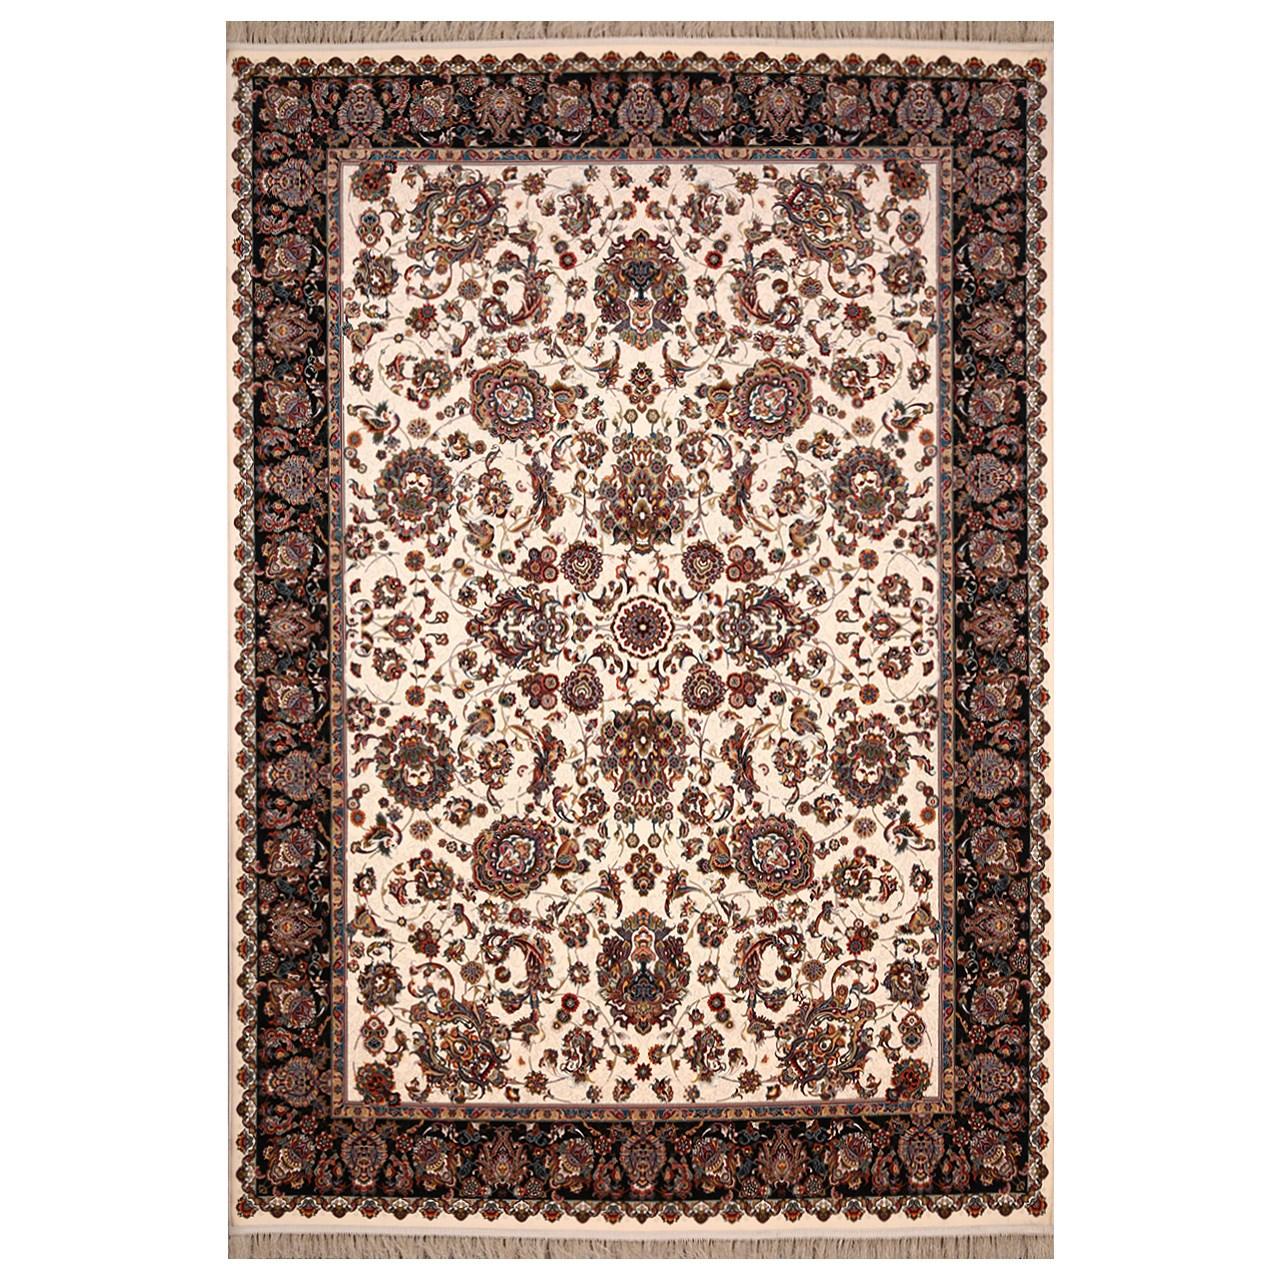 فرش ماشینی فرش هدیه طرح ثریا زمینه کرم